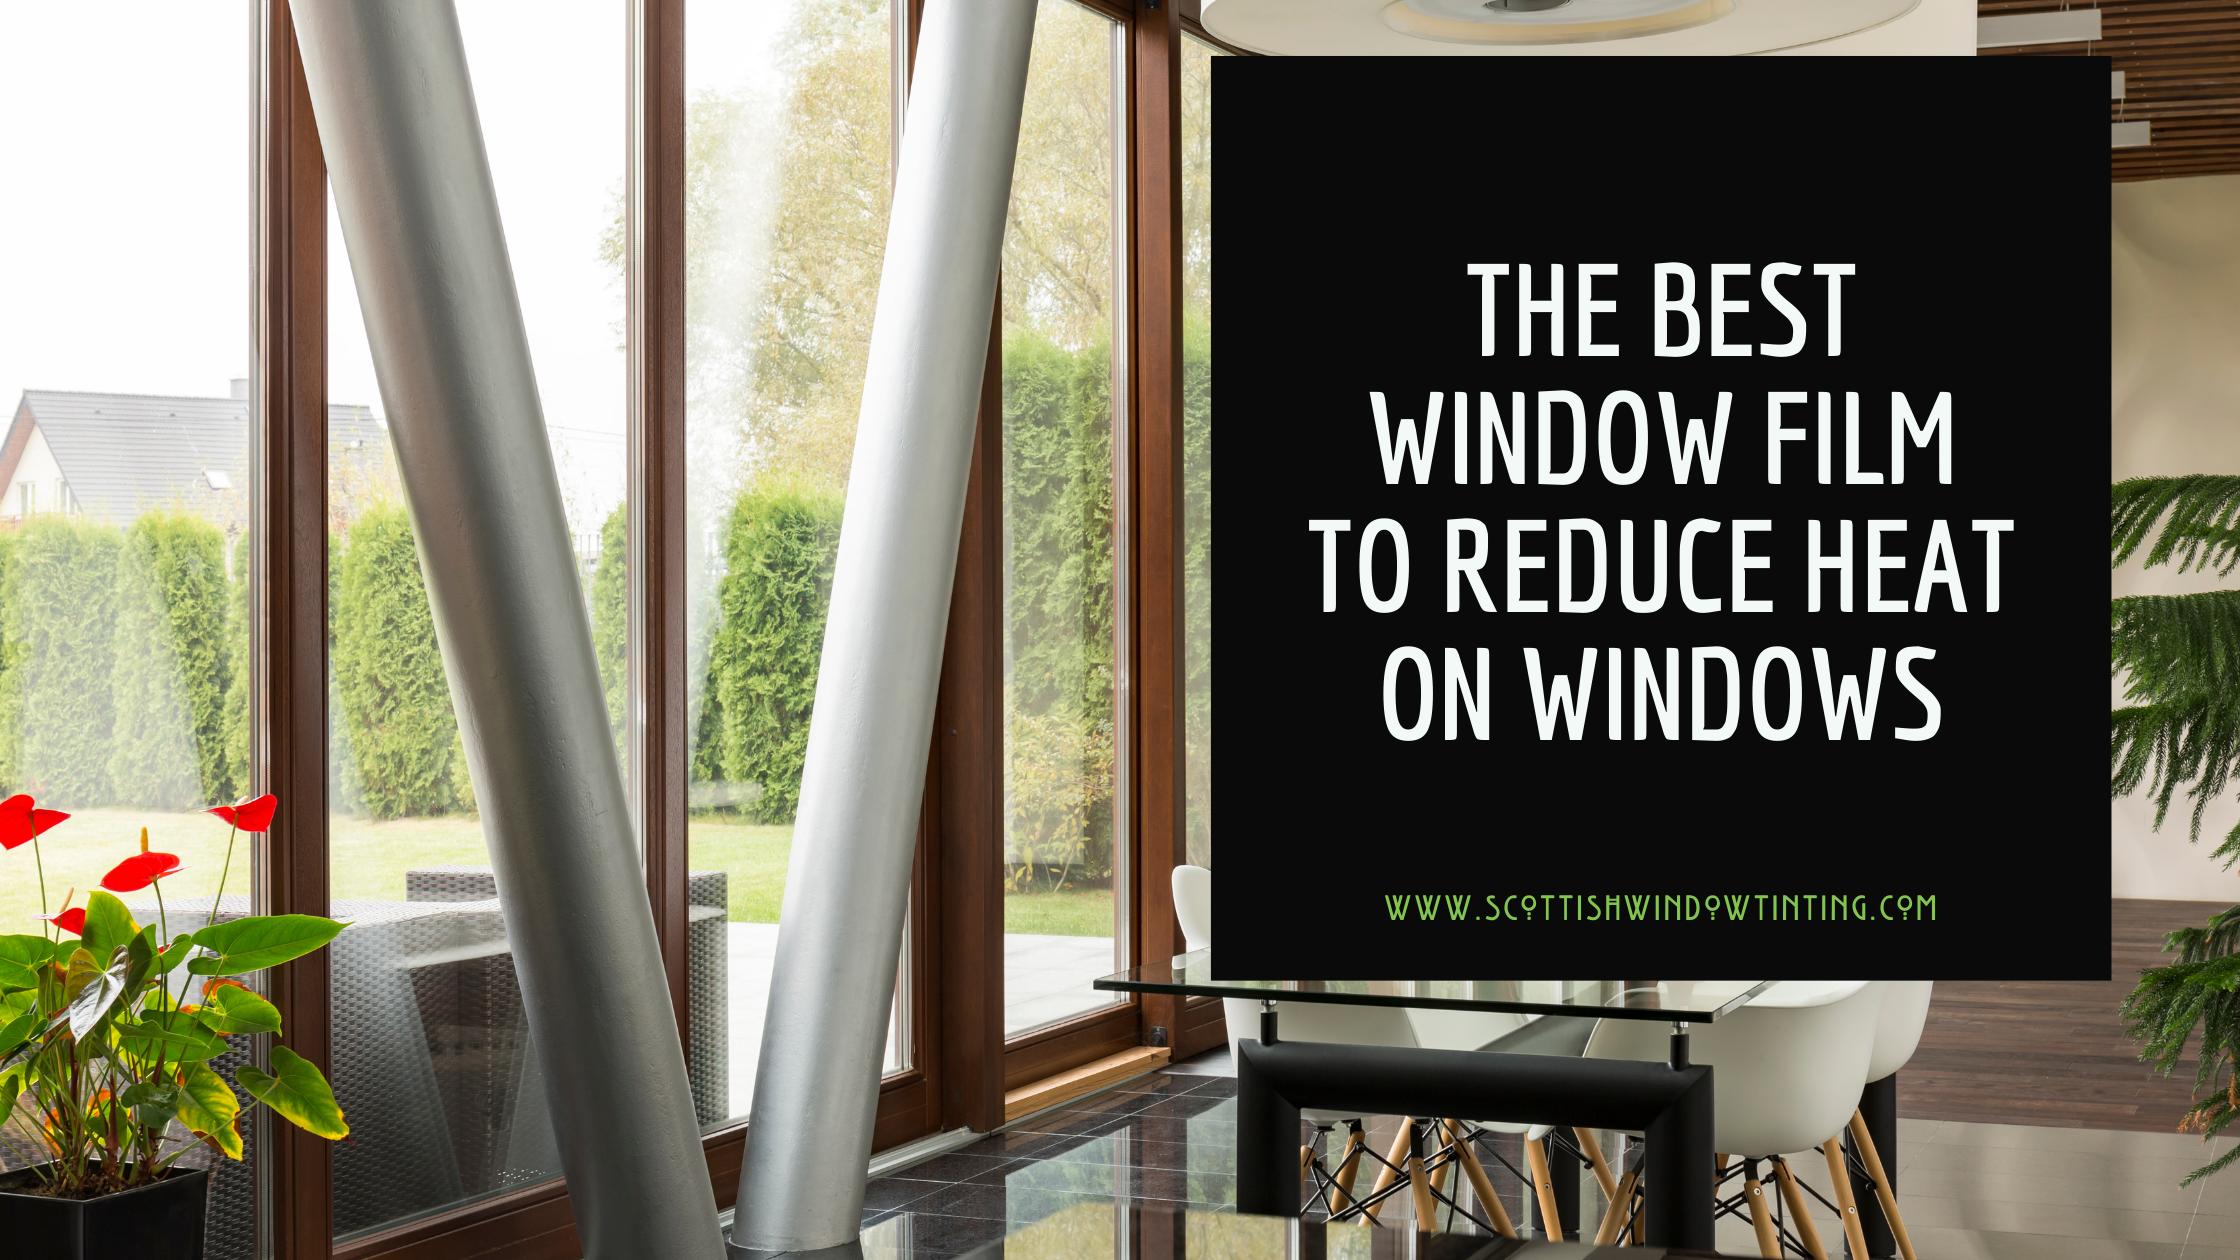 Where to Use Window Tinting to Reduce Heat on Windows